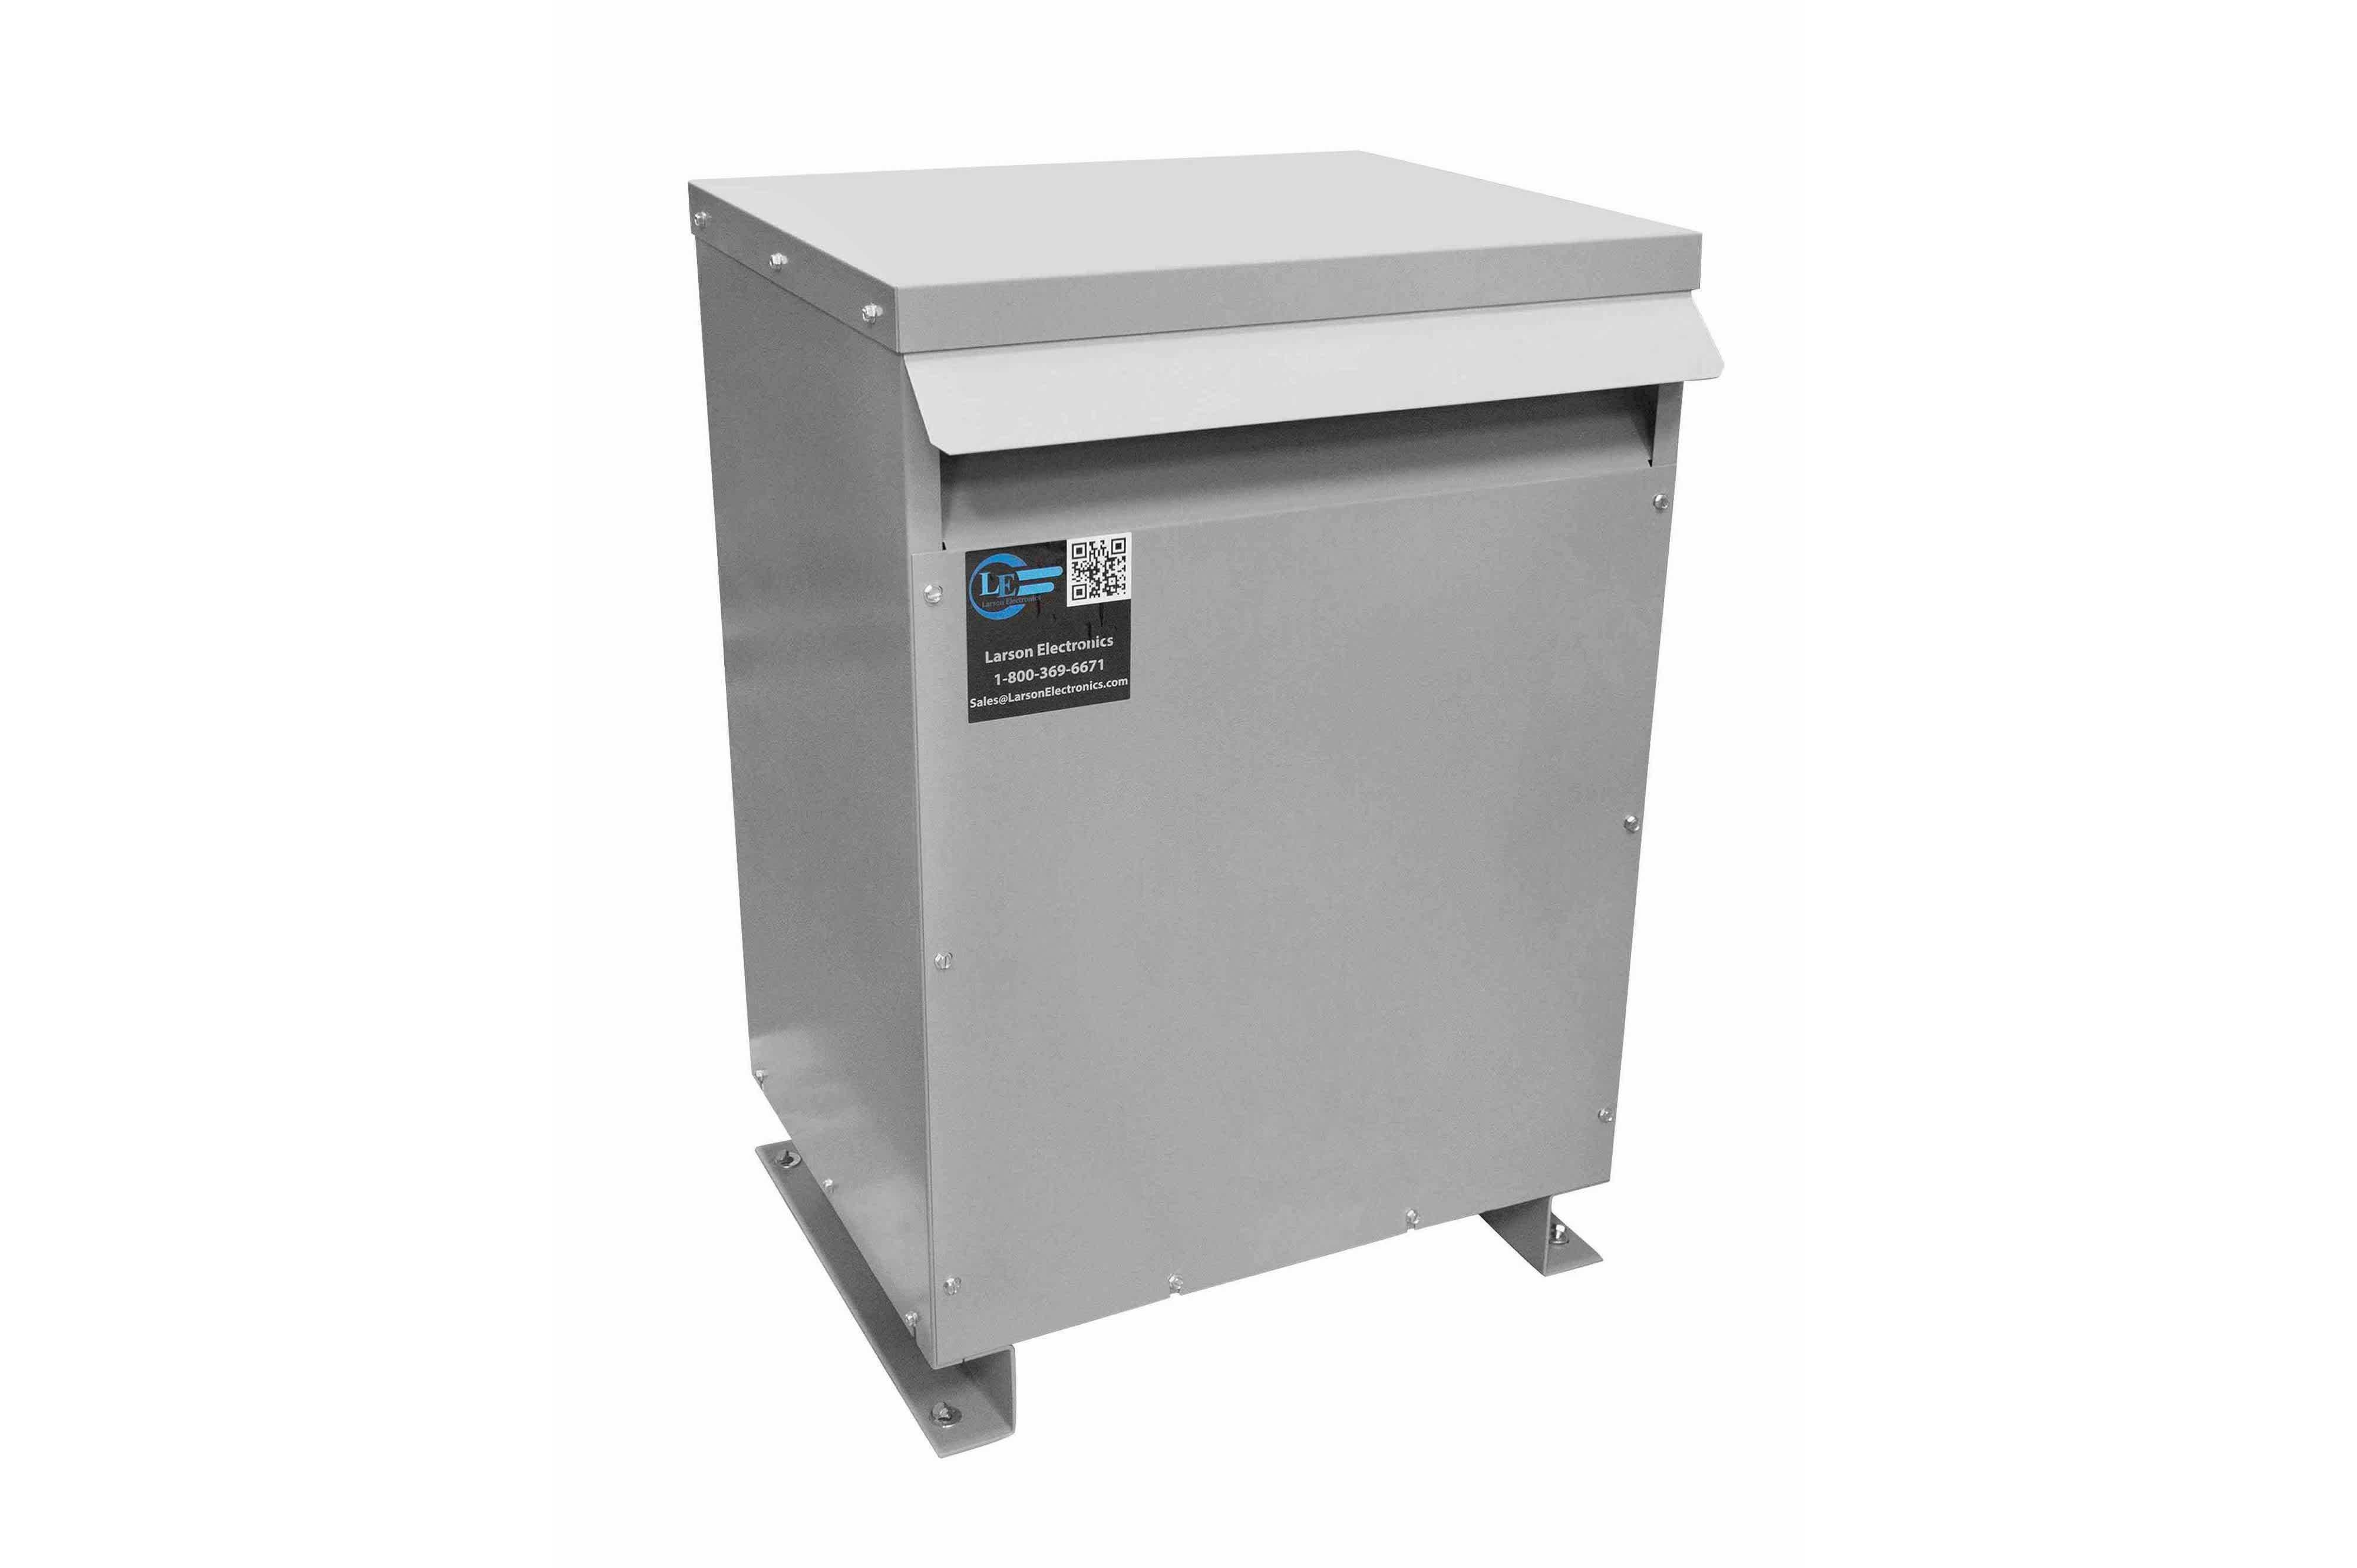 52.5 kVA 3PH Isolation Transformer, 240V Wye Primary, 600Y/347 Wye-N Secondary, N3R, Ventilated, 60 Hz